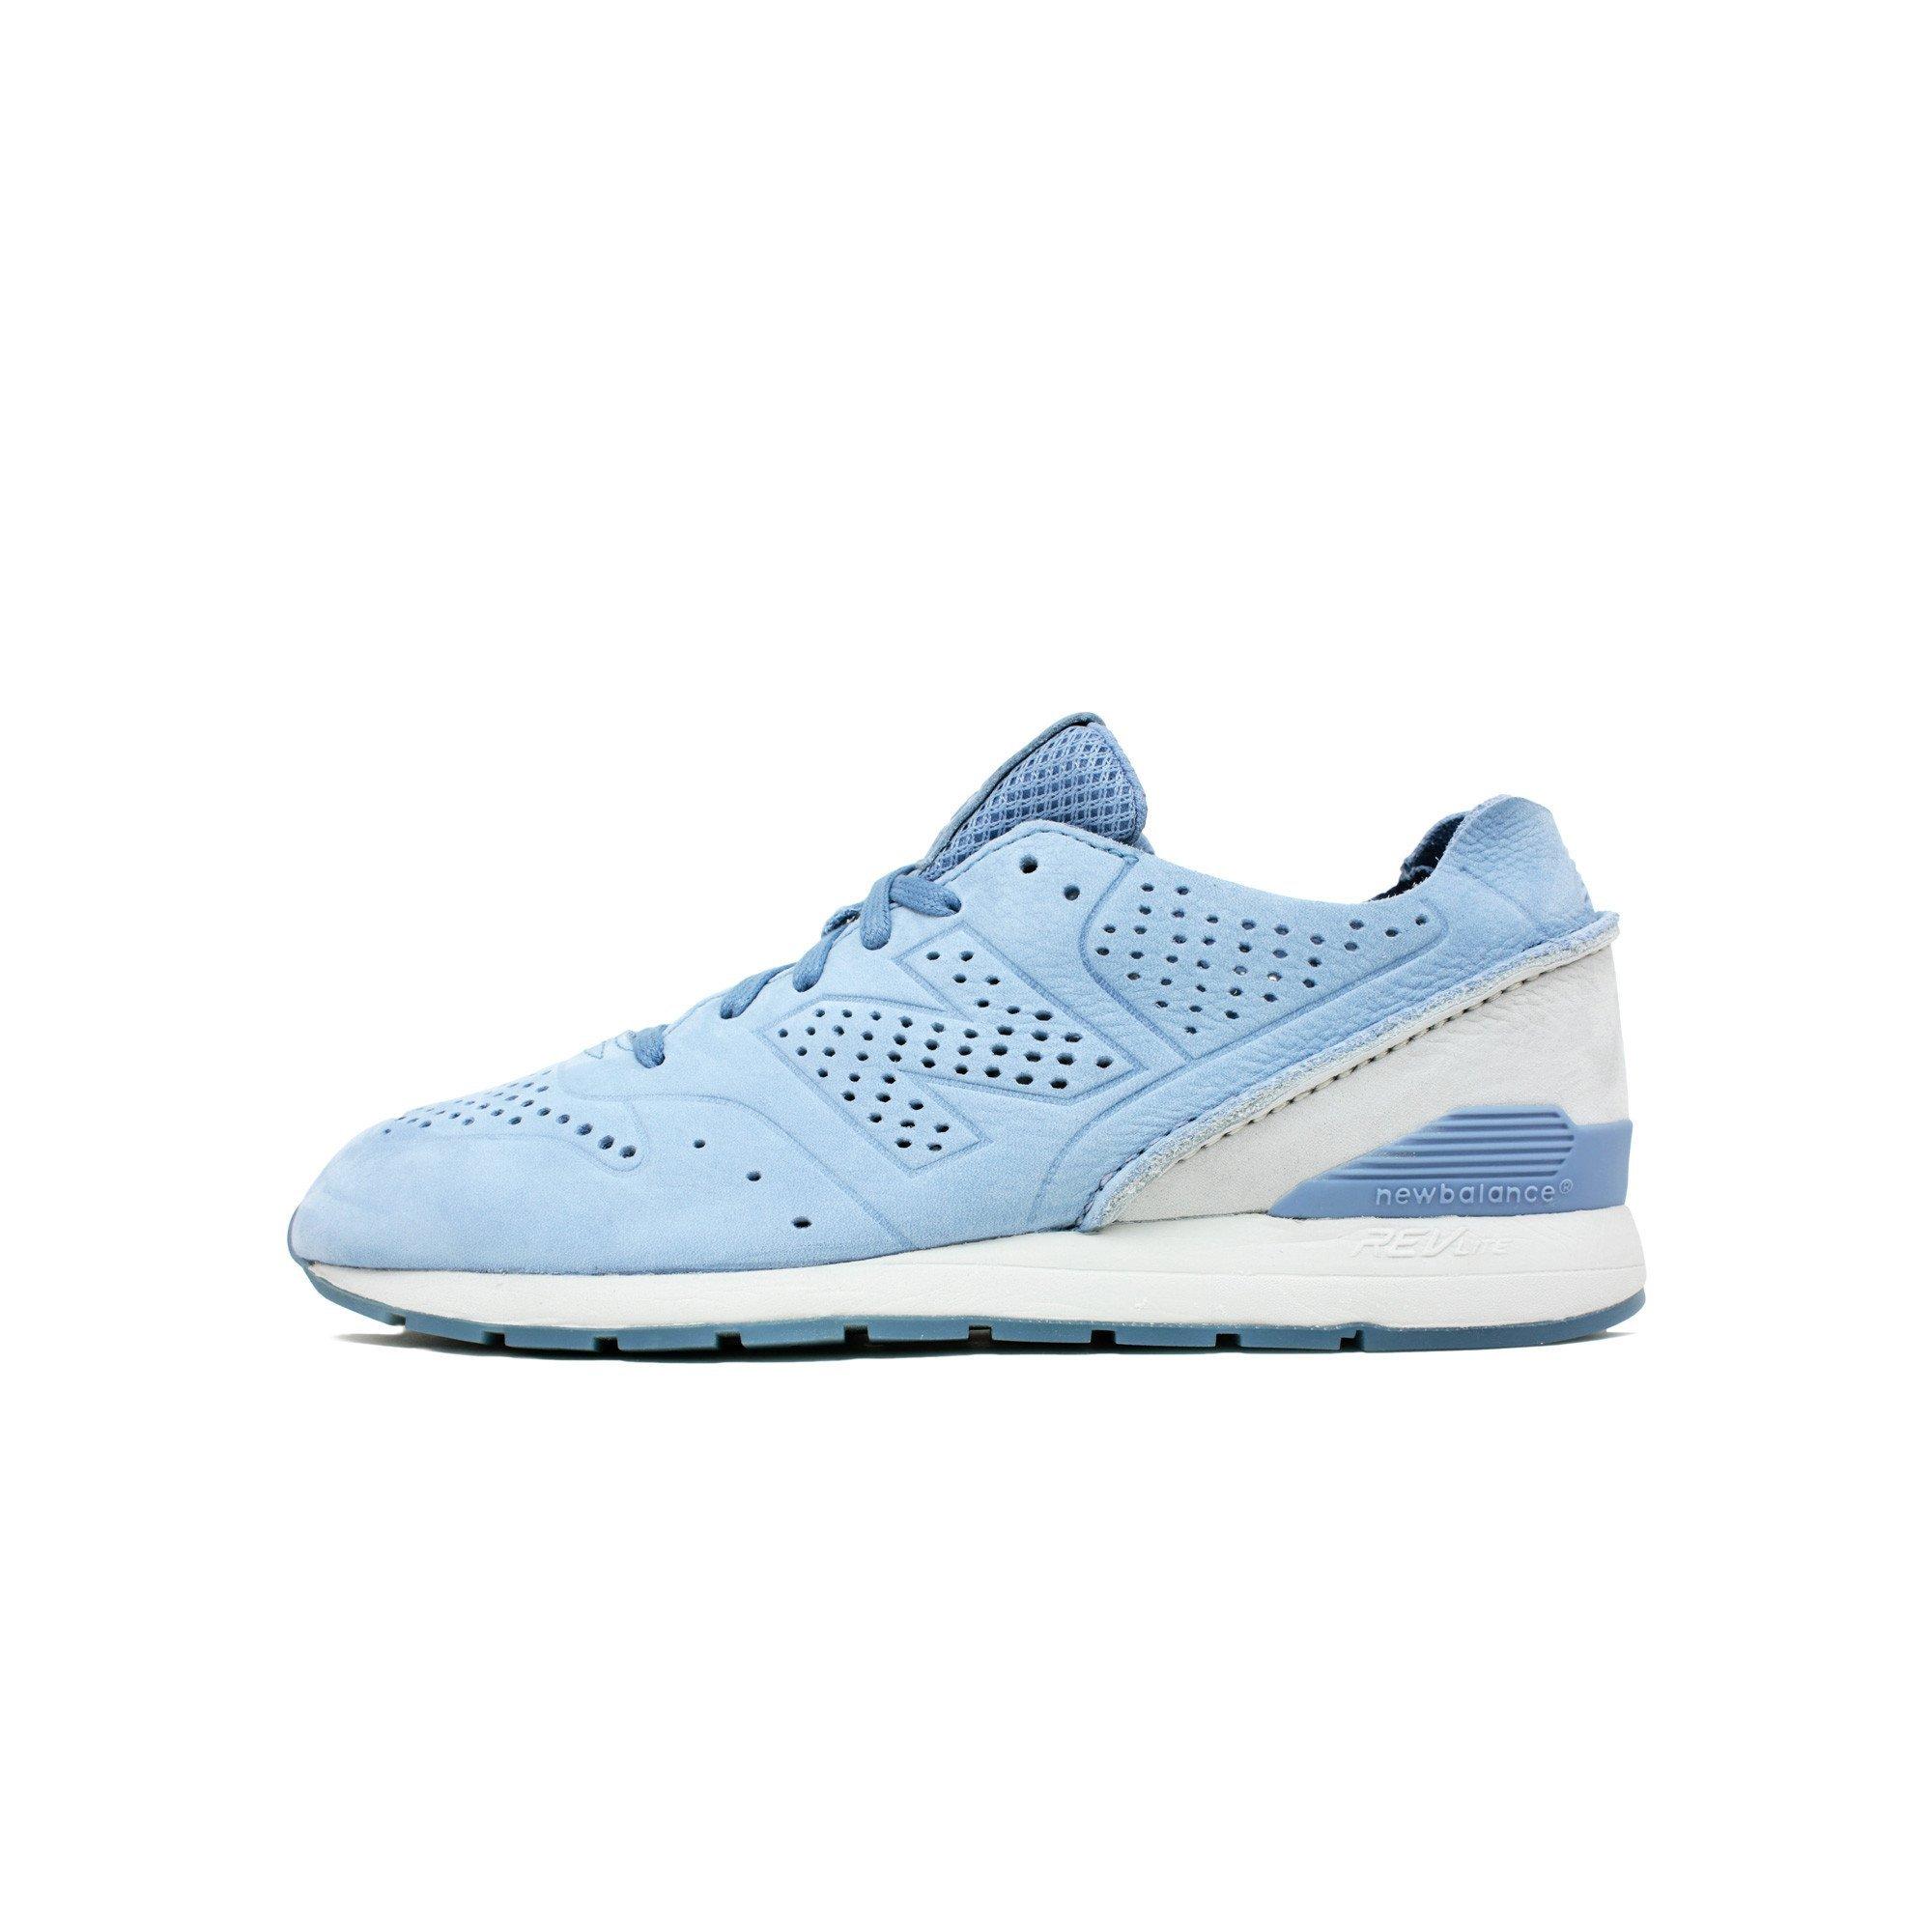 New Balance MRL696 DECONSTRUCTED SUMMER UTILITY mens fashion-sneakers MRL696DE_8.5D - BLUE/SLATE BLUE/CONCRETE